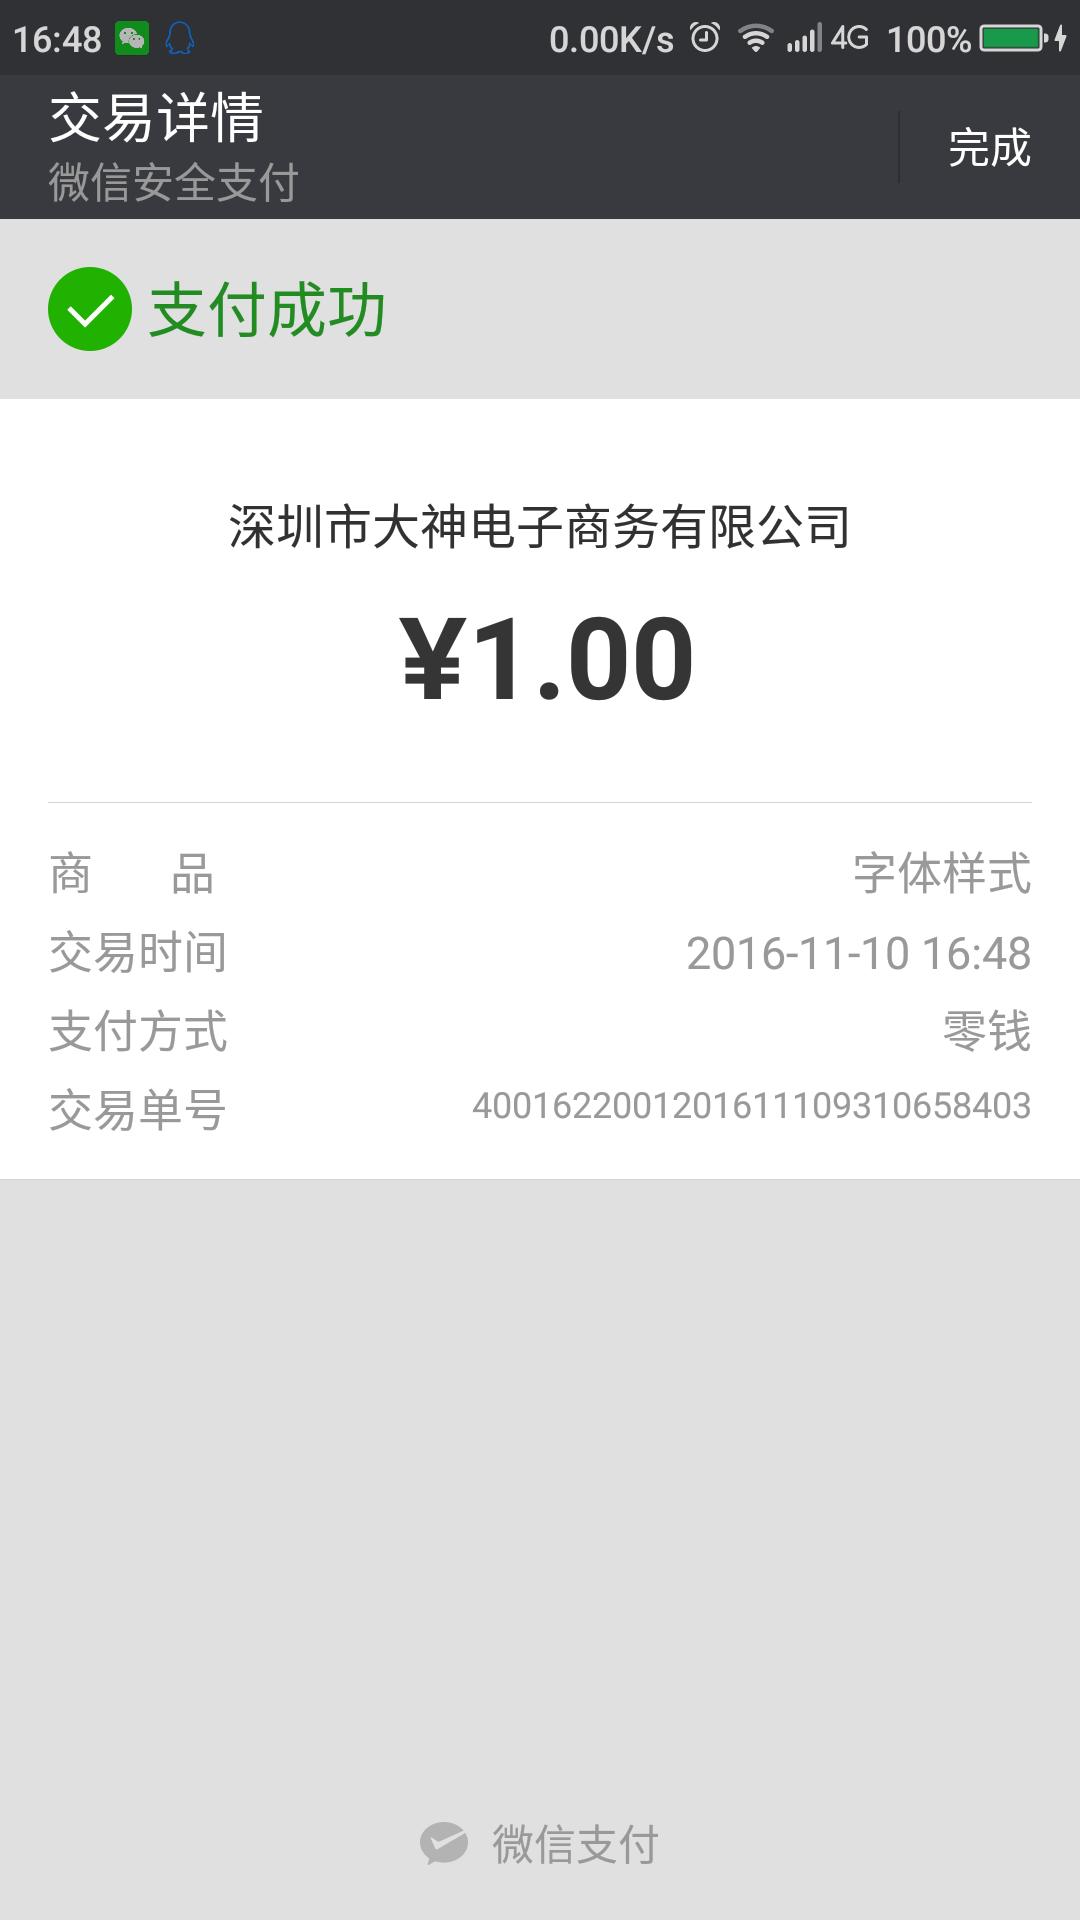 Screenshot_2016-11-10-16-48-24.png